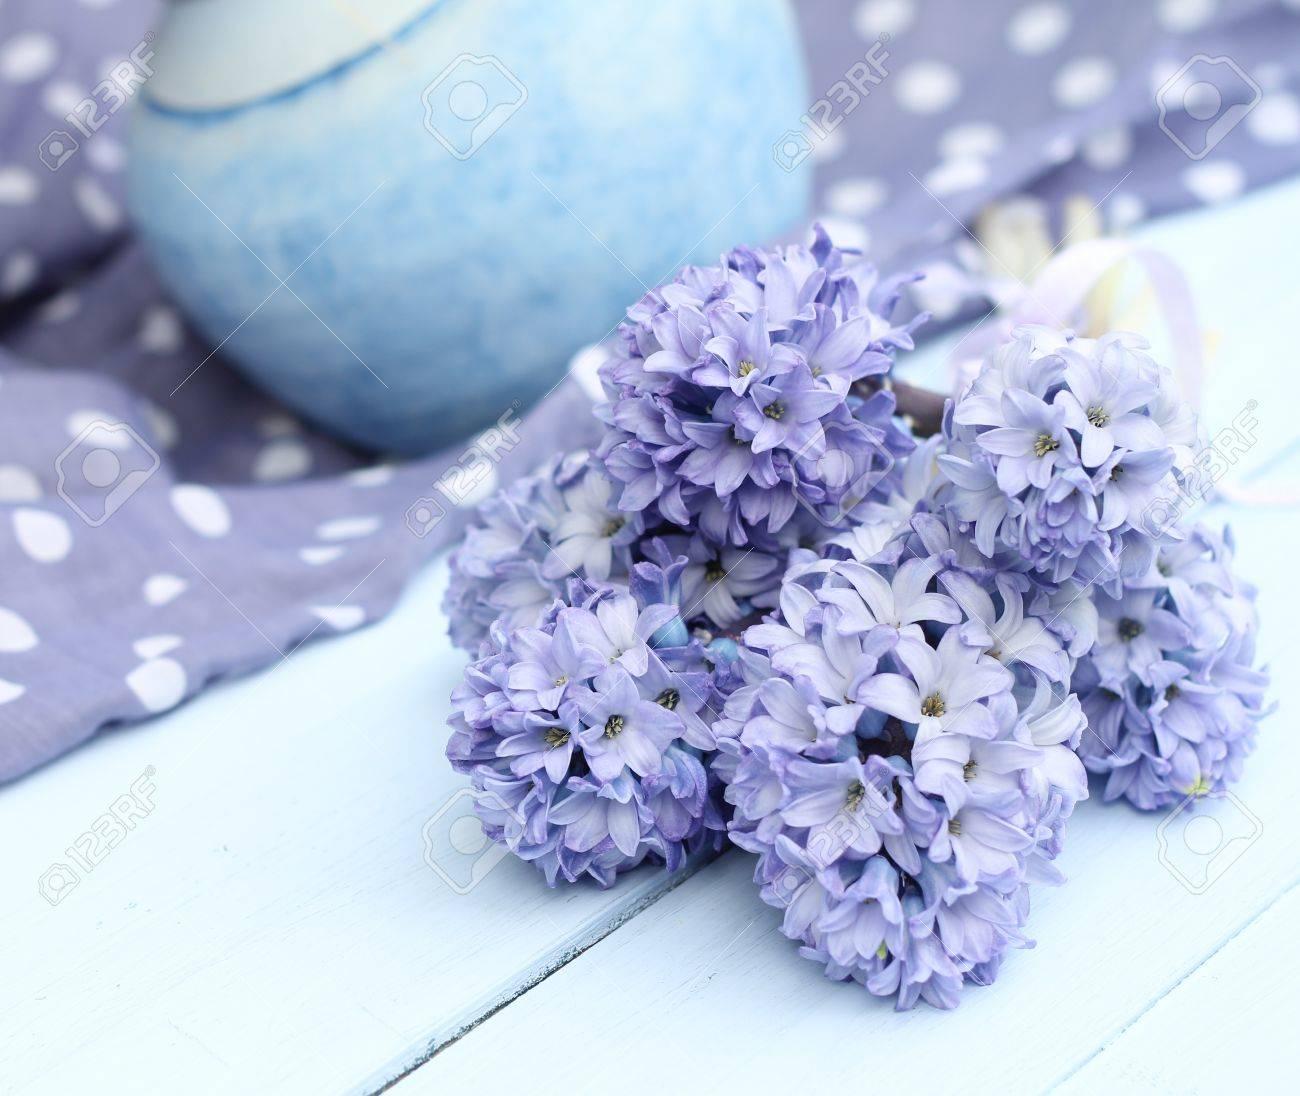 Blau Lila Hyazinthe Auf Enteei Blaues Hell Bemalten Holzdielenboden